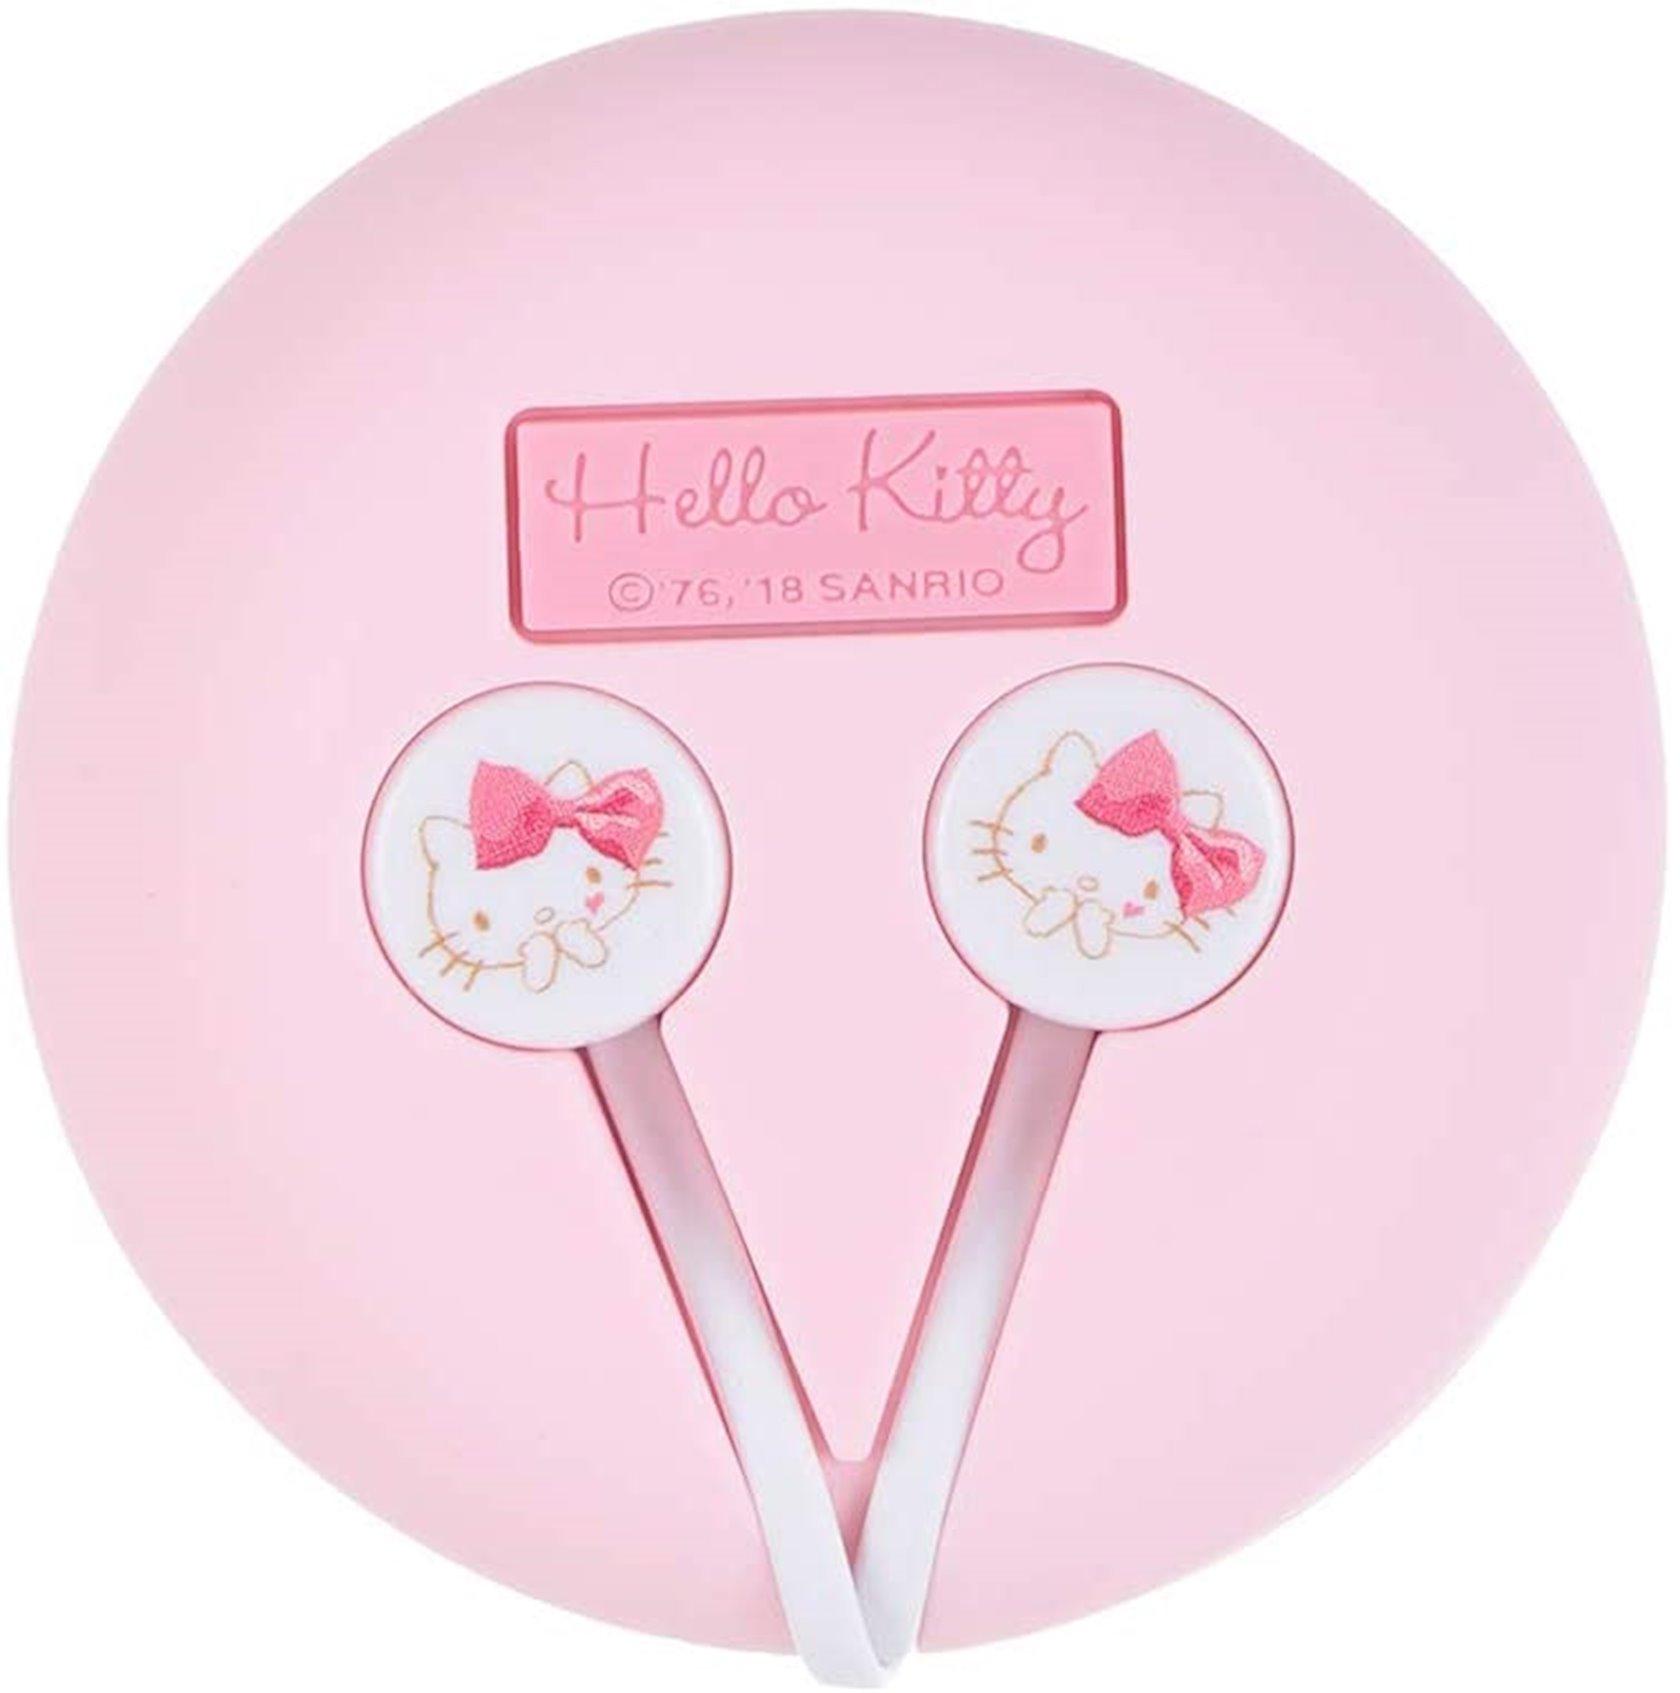 Simli qulaqlıqlar Miniso Sanrio - Hello Kitty